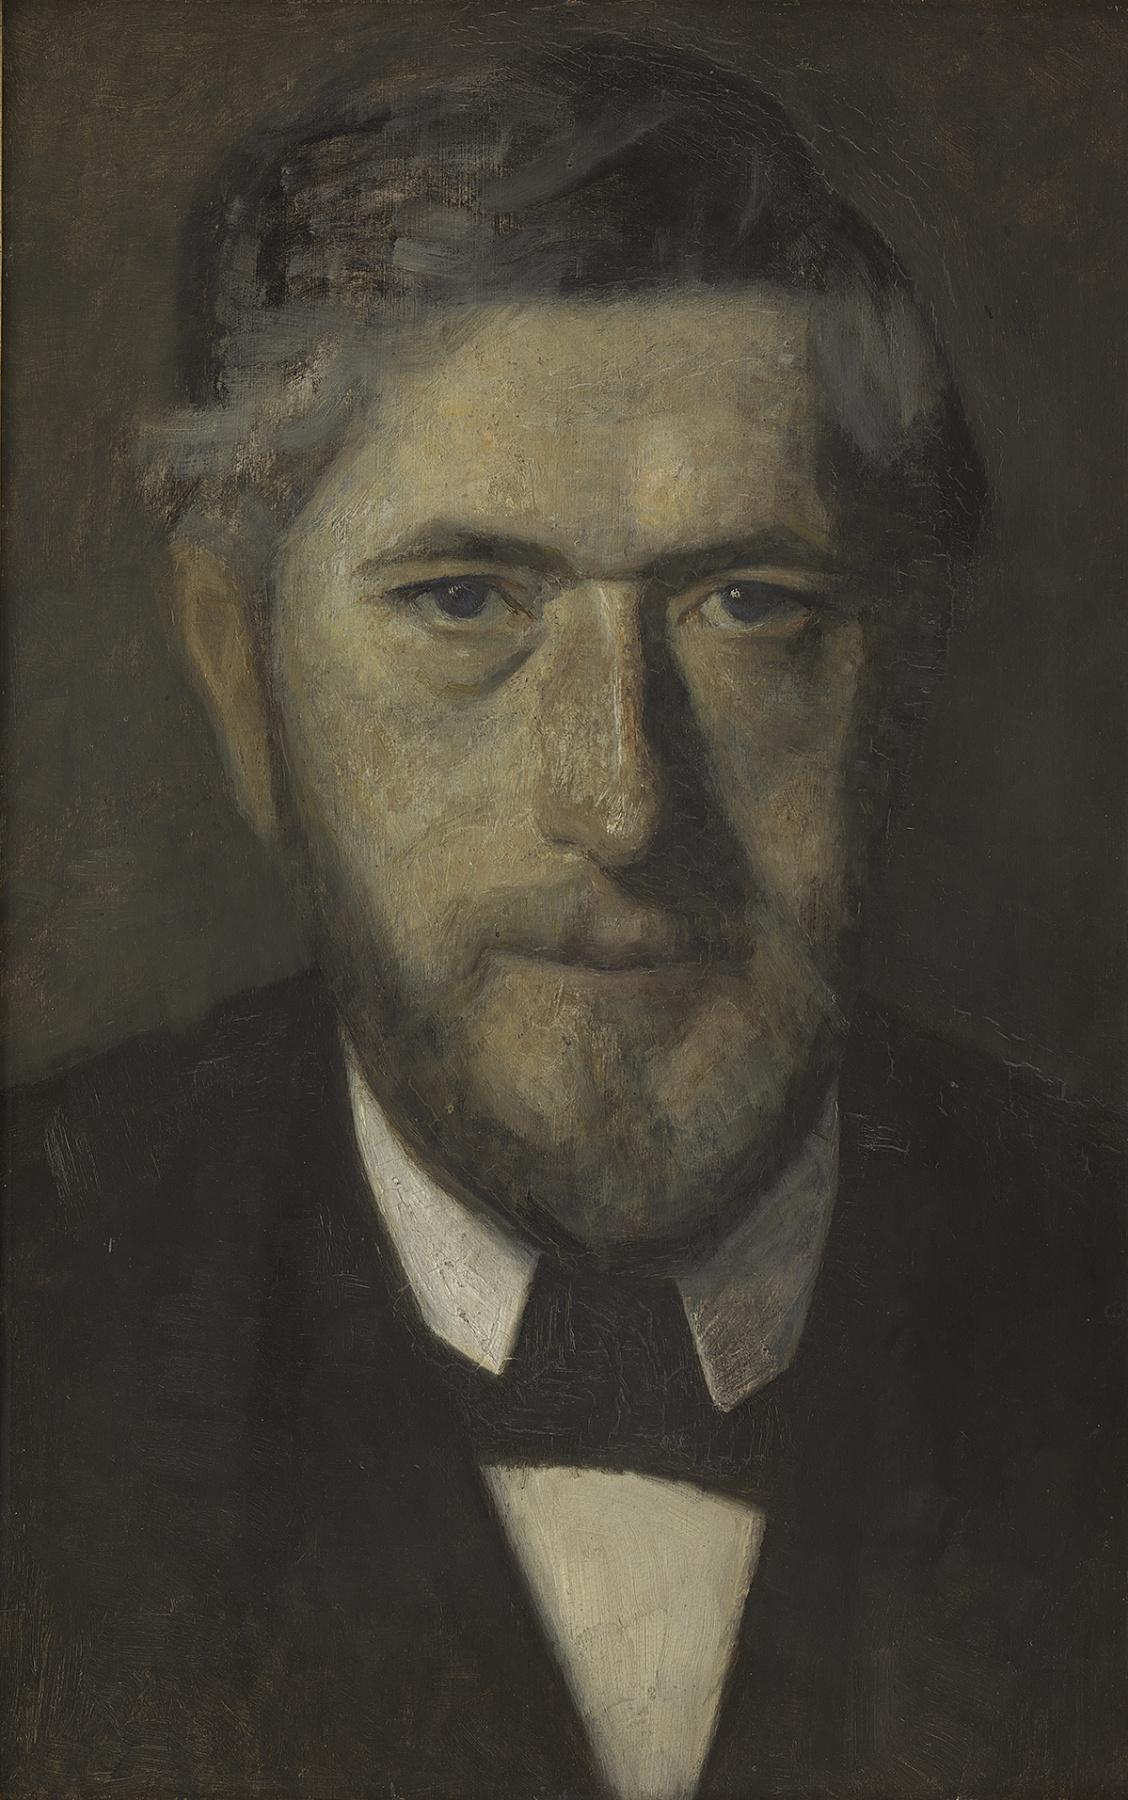 Vilhelm Hammershøi. JF Willamsen